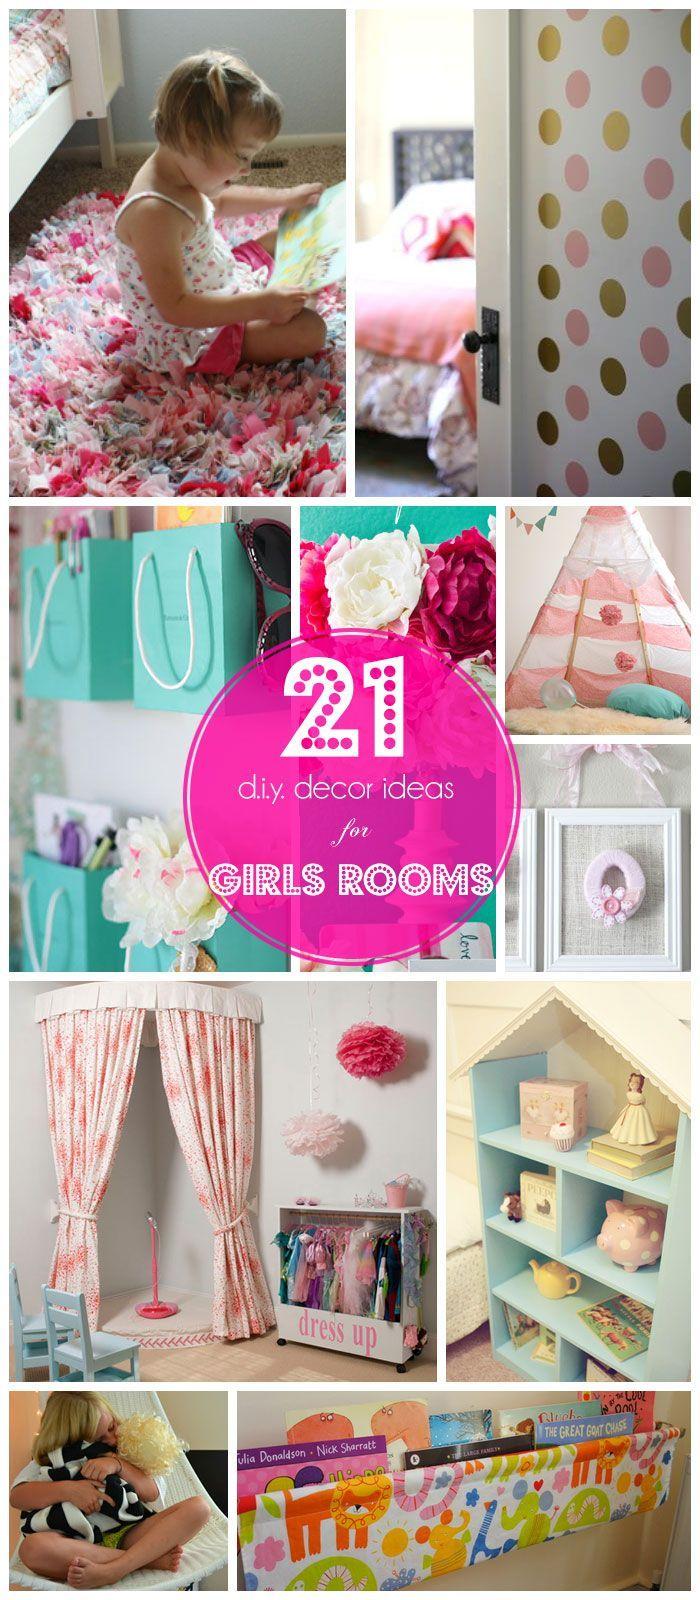 Best 25 alphabet wall ideas on pinterest playroom decor - Diy decorating ideas for bedroom walls ...